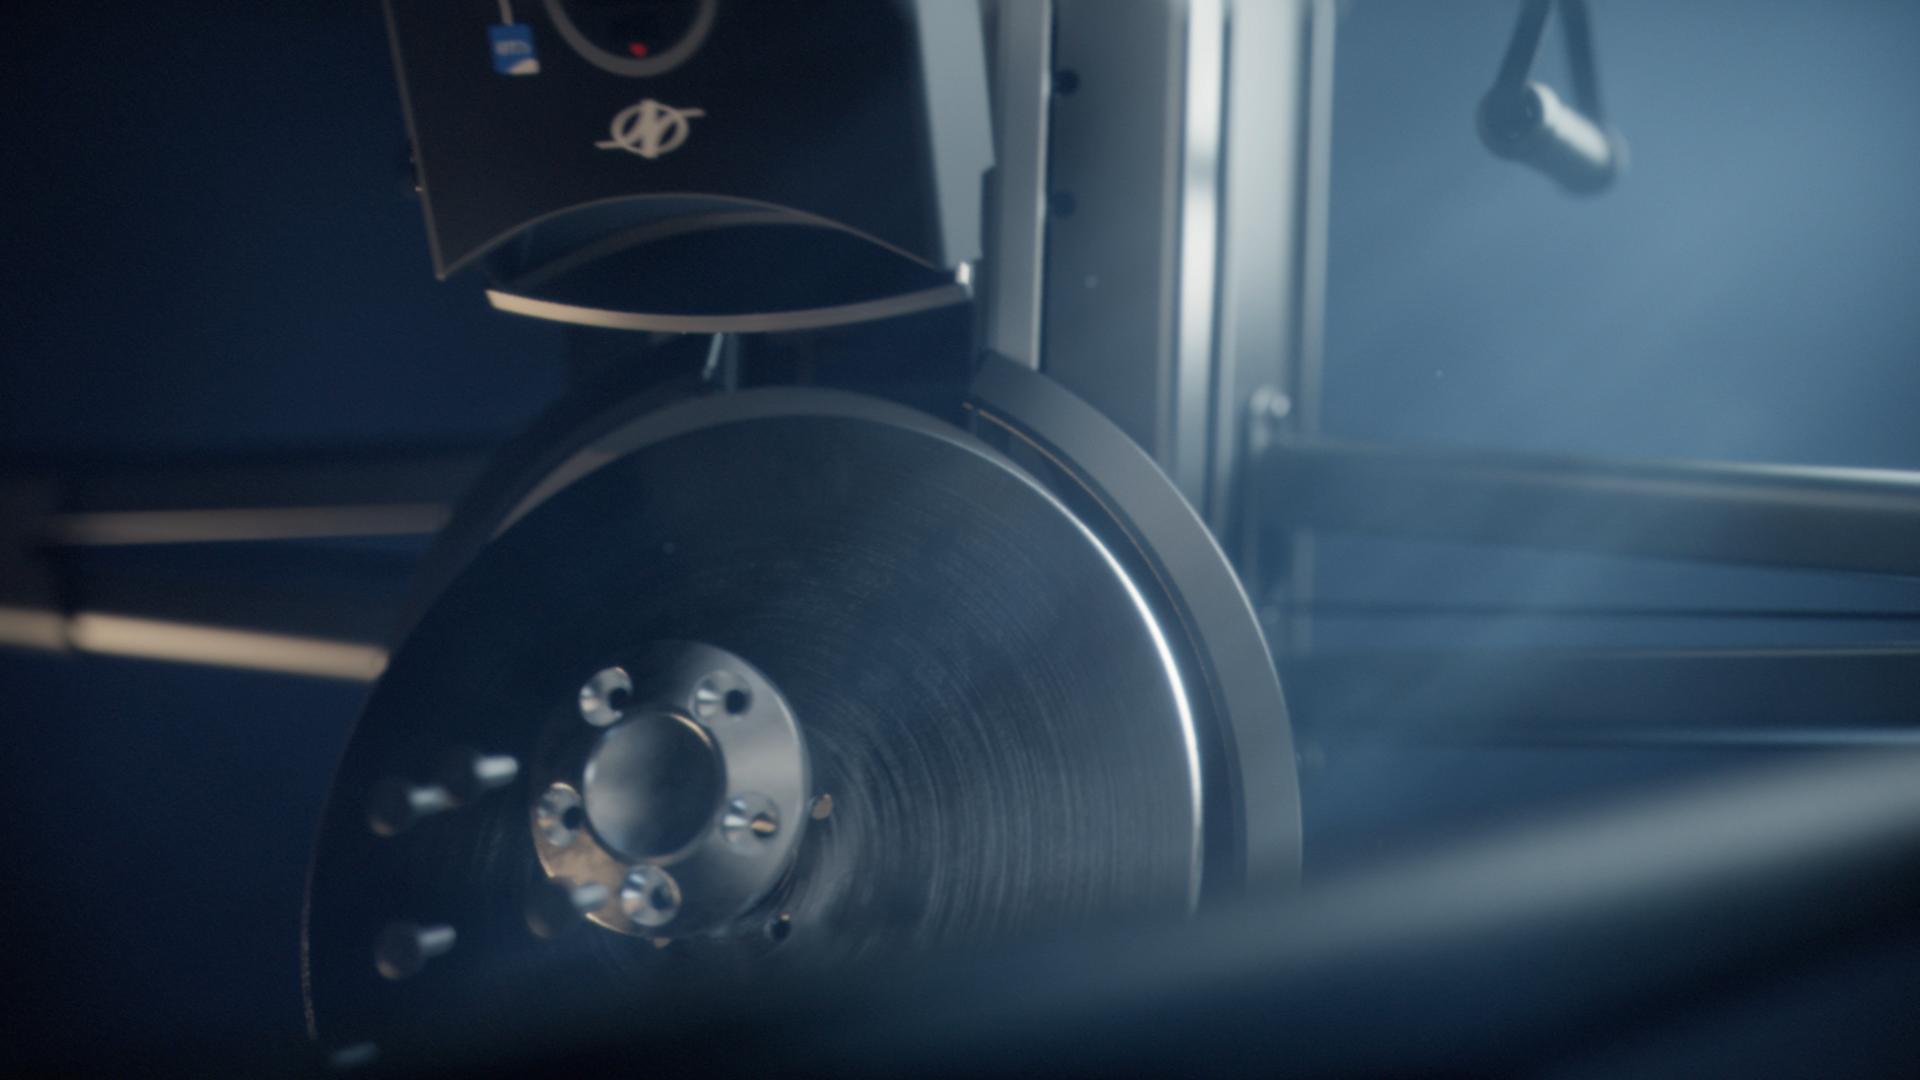 VINICIUS NALDI - Home Workouts Led by Elite Coaches On The NordicTrack Fusion CST (00087)